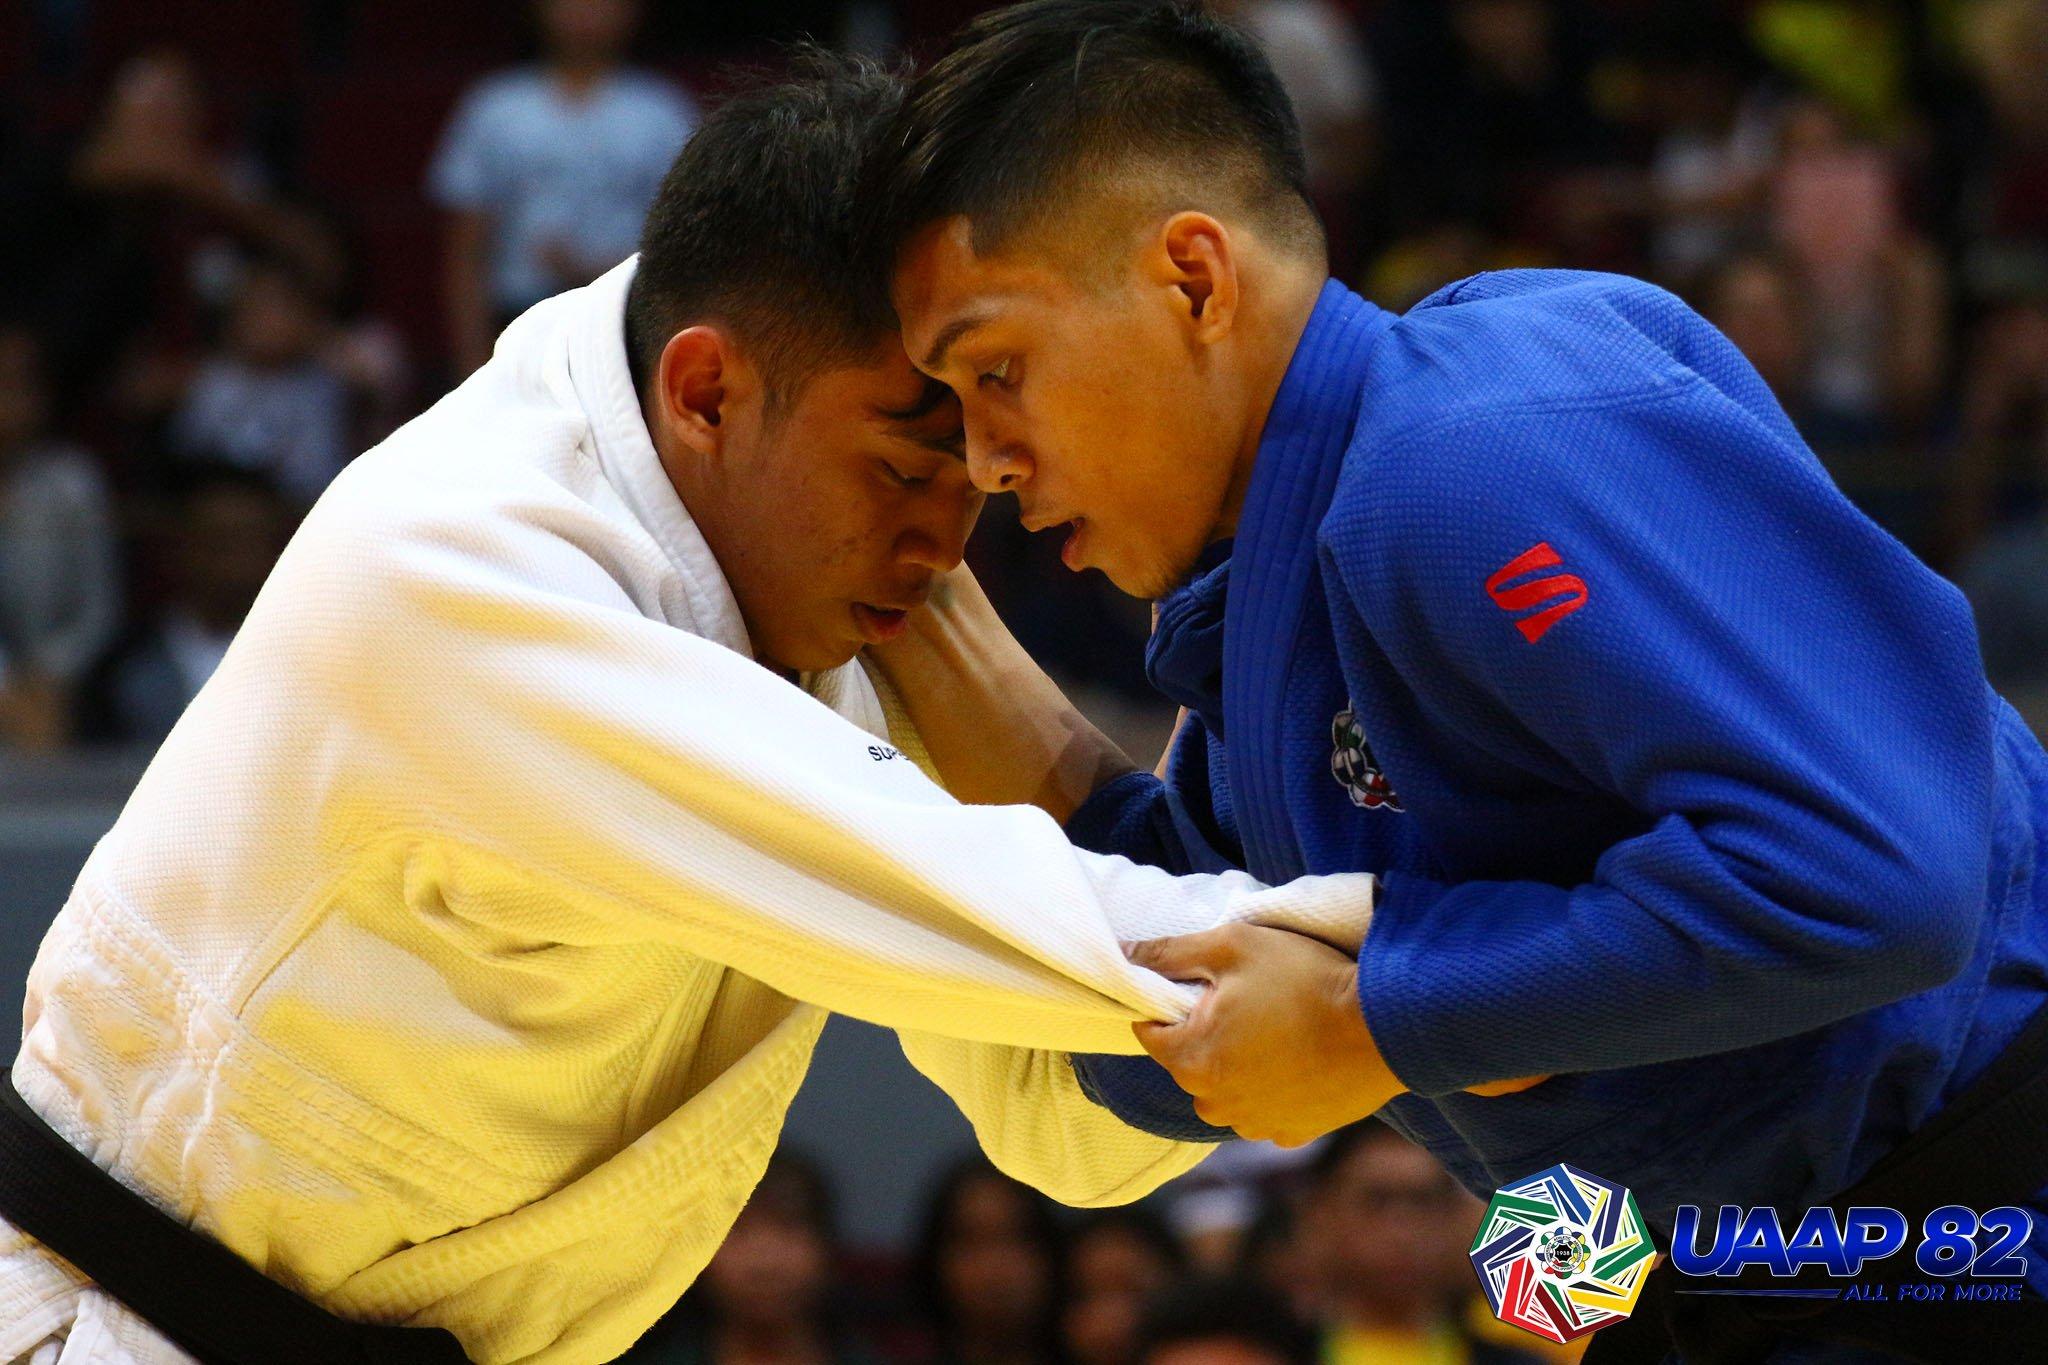 UAAP-82-Mens-Judo-Minus-66-HLW-Final-UP-v-UST-Benavides-Figueroa Rookie Ligero, senior Lorenzo lift UST to UAAP Judo four-peat ADMU Judo News UAAP UP UST  - philippine sports news